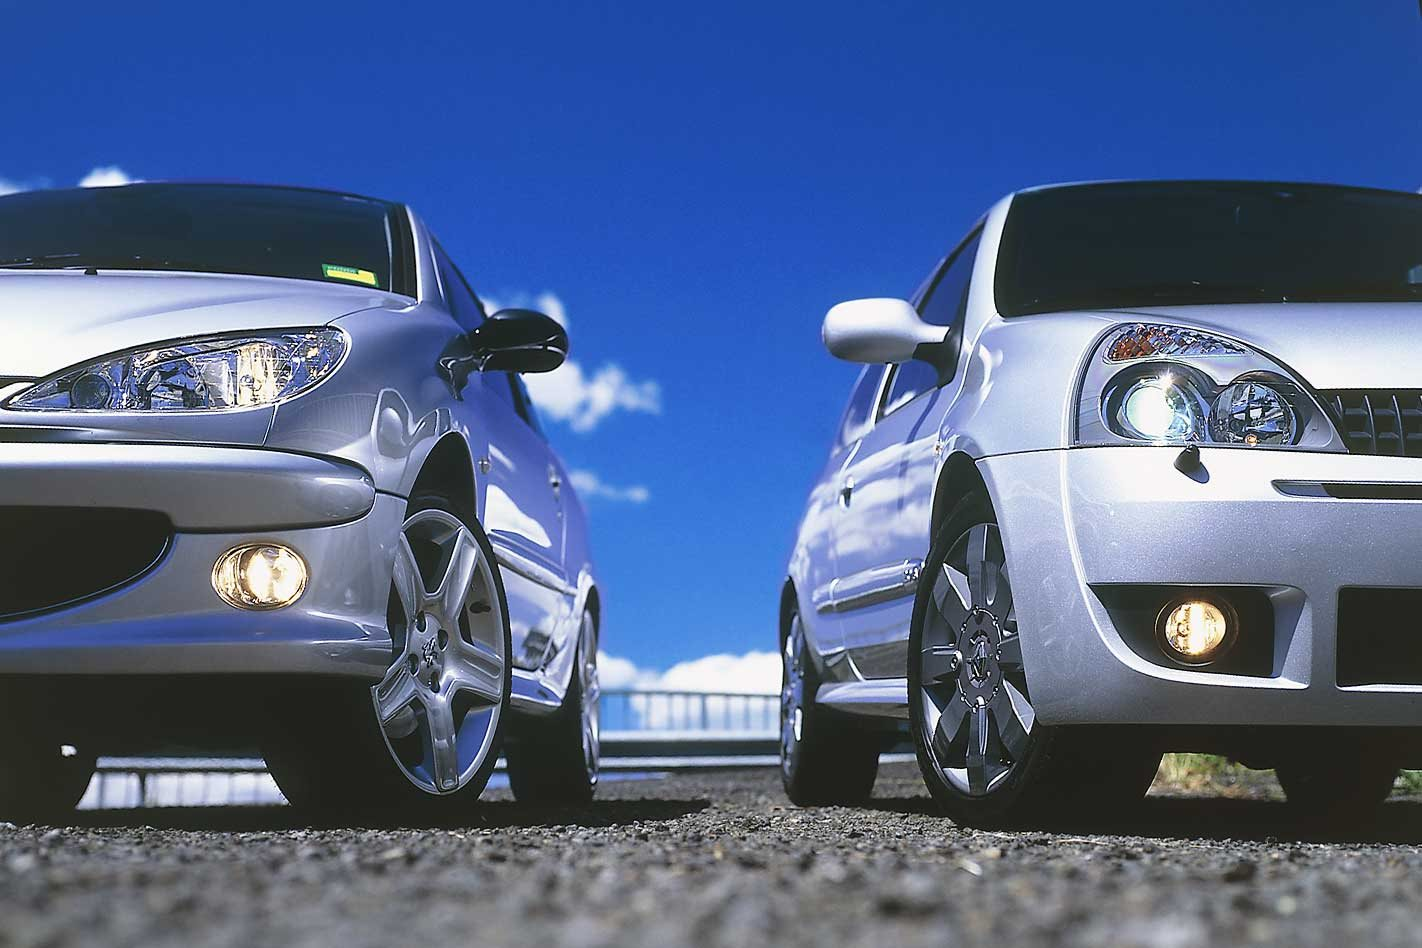 2005 Renault Sport Clio Cup Vs Peugeot 206 Gti Comparison Review Classic Motor